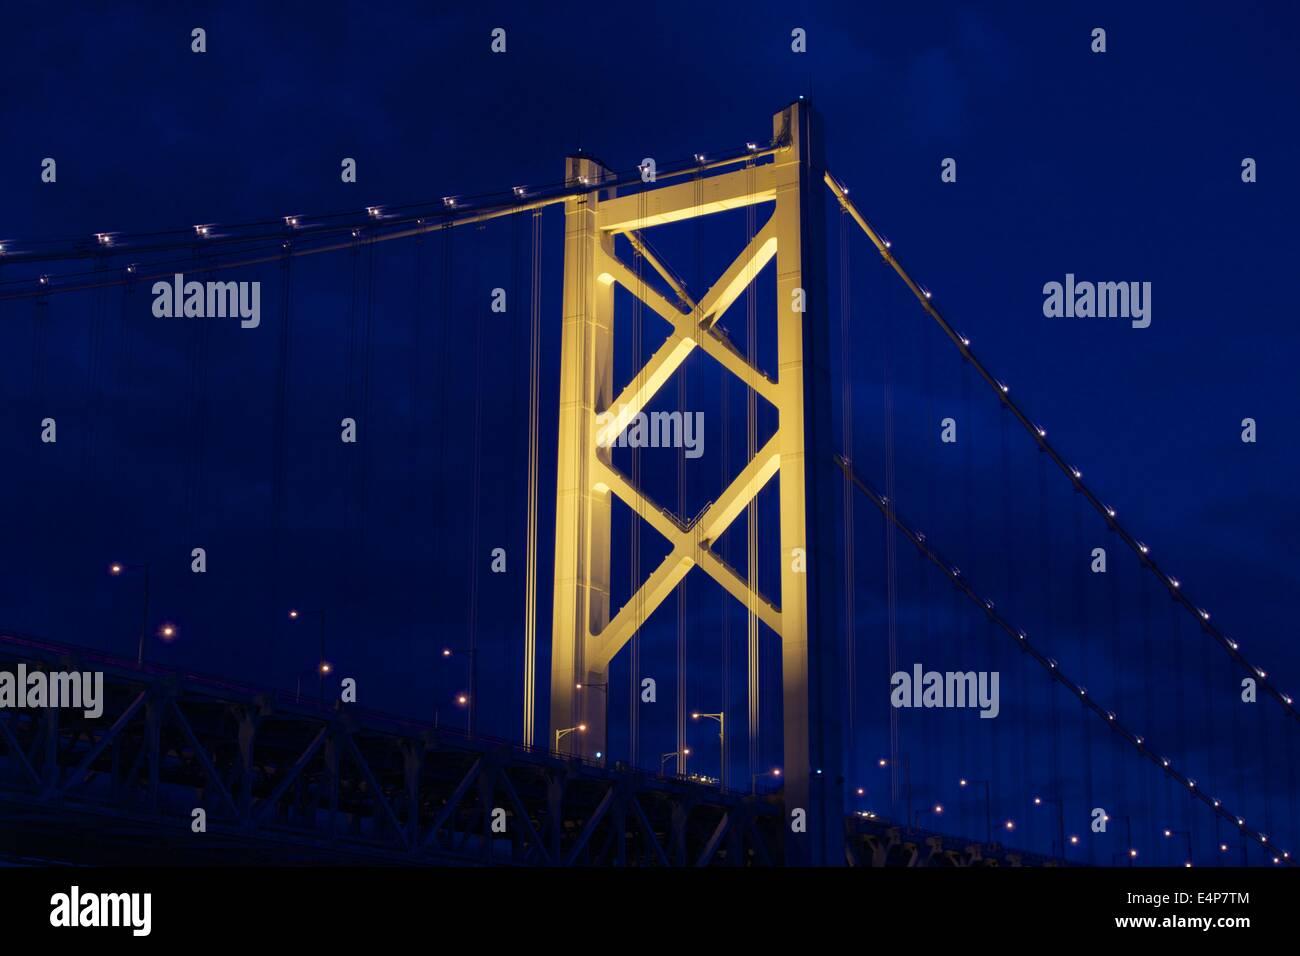 Great Seto Bridge (Seto Ohashi) at Night in Kagawa Prefecture, Japan - Stock Image